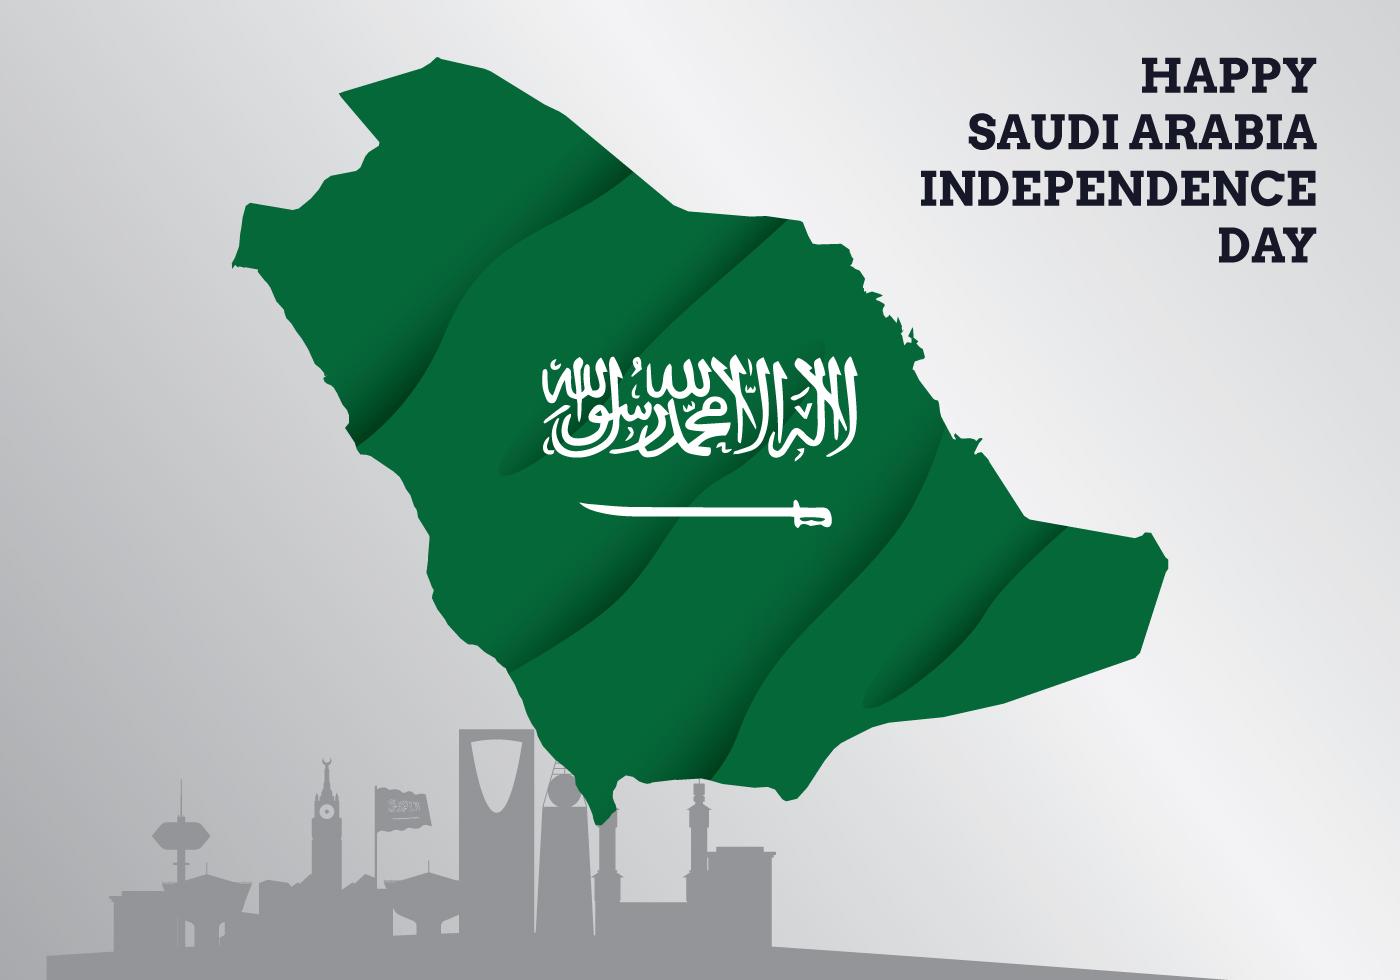 Saudi Arabia Map Free Vector Art - (24 Free Downloads) on jsa map, iran map, united arab emirates, bangladesh map, middle east map, japan map, egypt map, small kansas town map, uae map, riyadh map, dubai map, middle east, australia map, oman map, doha map, saudi arbia map, arabian peninsula, abu dhabi, rsa map, bahrain map, england map, philippines map, arabia map,